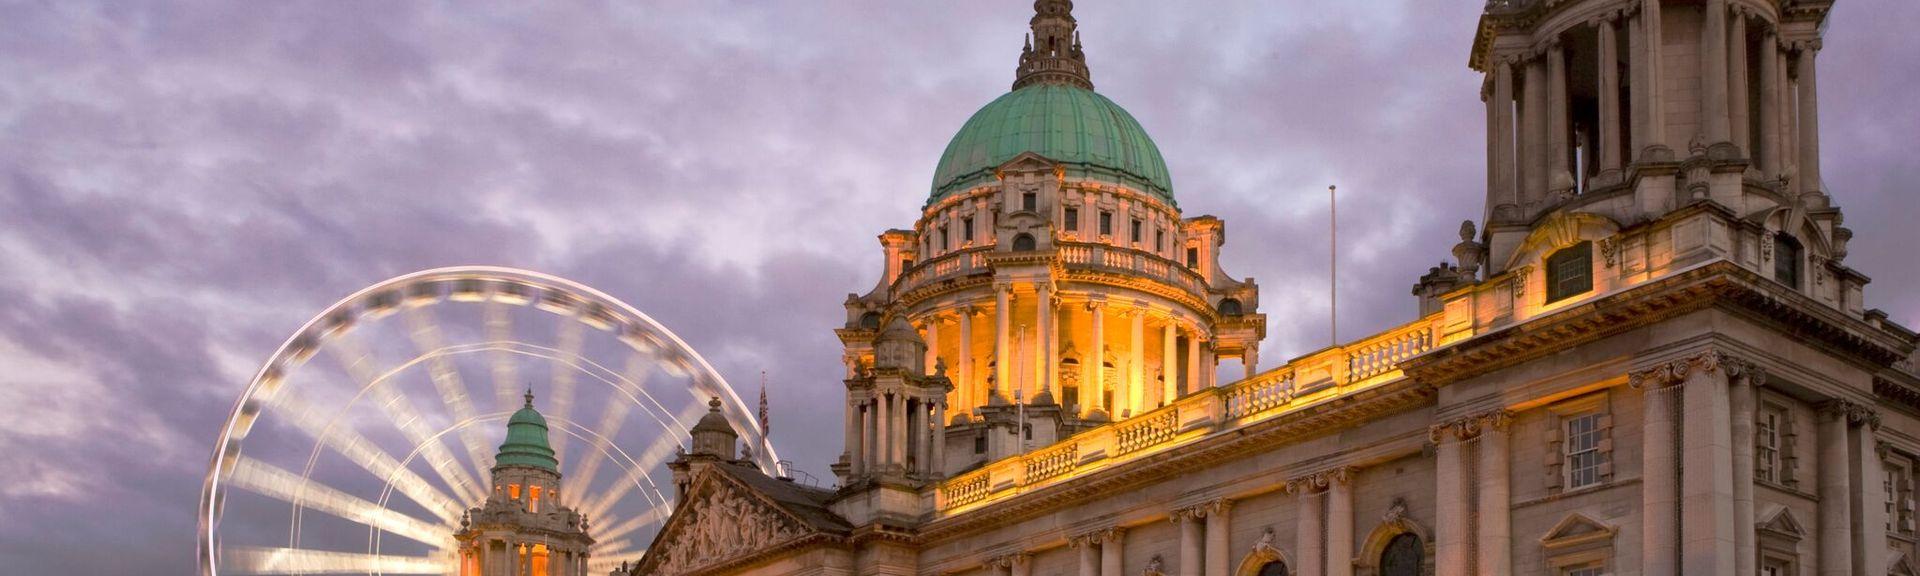 Belfast, Irlande du Nord, Royaume-Uni